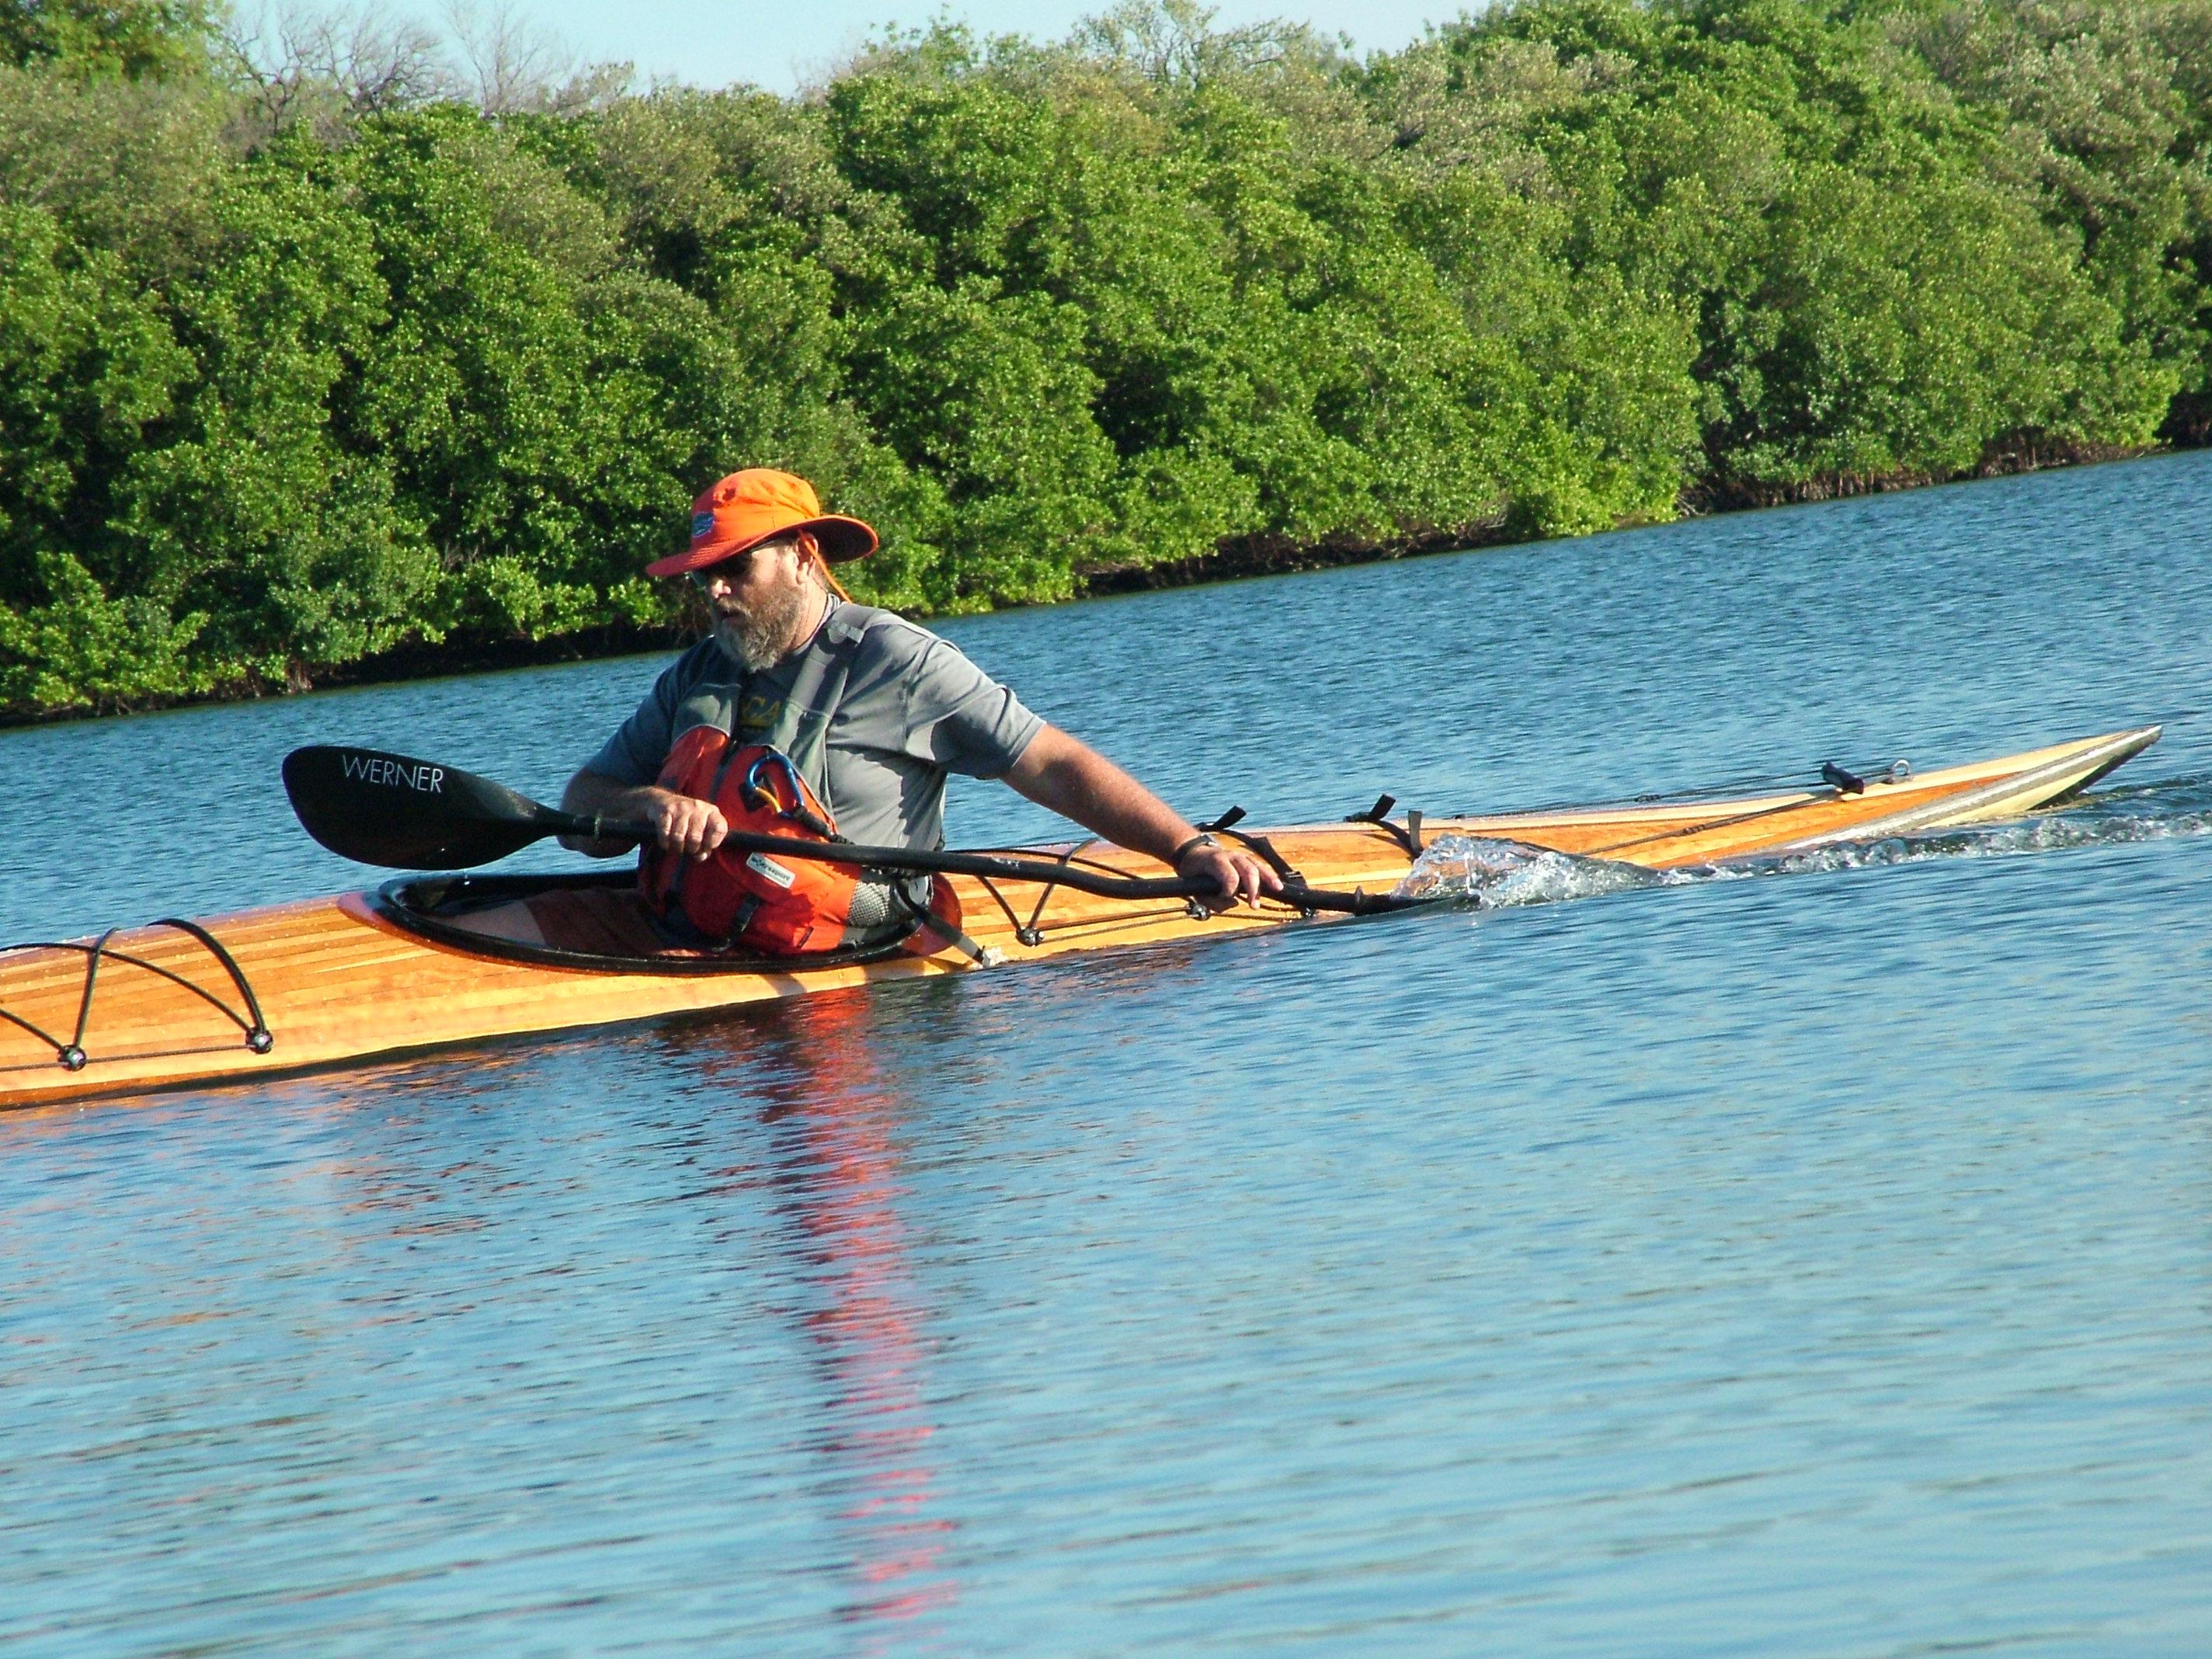 DIY Wood Kayak Plans Kits Wooden PDF finish woodworking | ragged62xlq